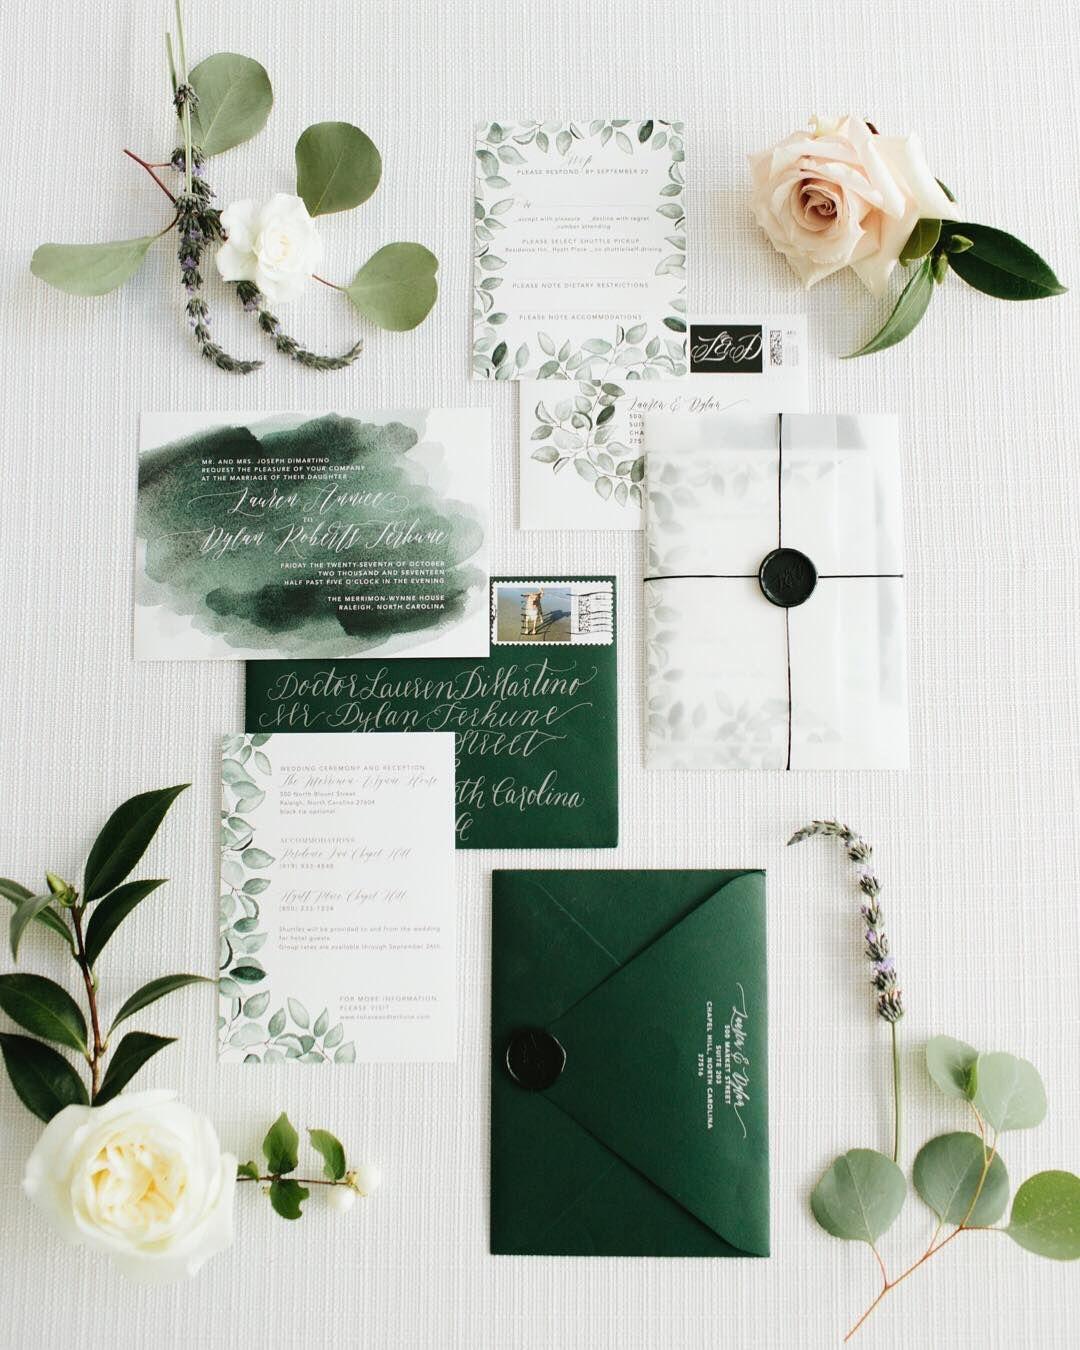 Custom Wedding Invitations On Instagram Loved Seeing Lauren And Dylan S Beau Green Wedding Invitations Country Wedding Invitations Custom Wedding Invitations